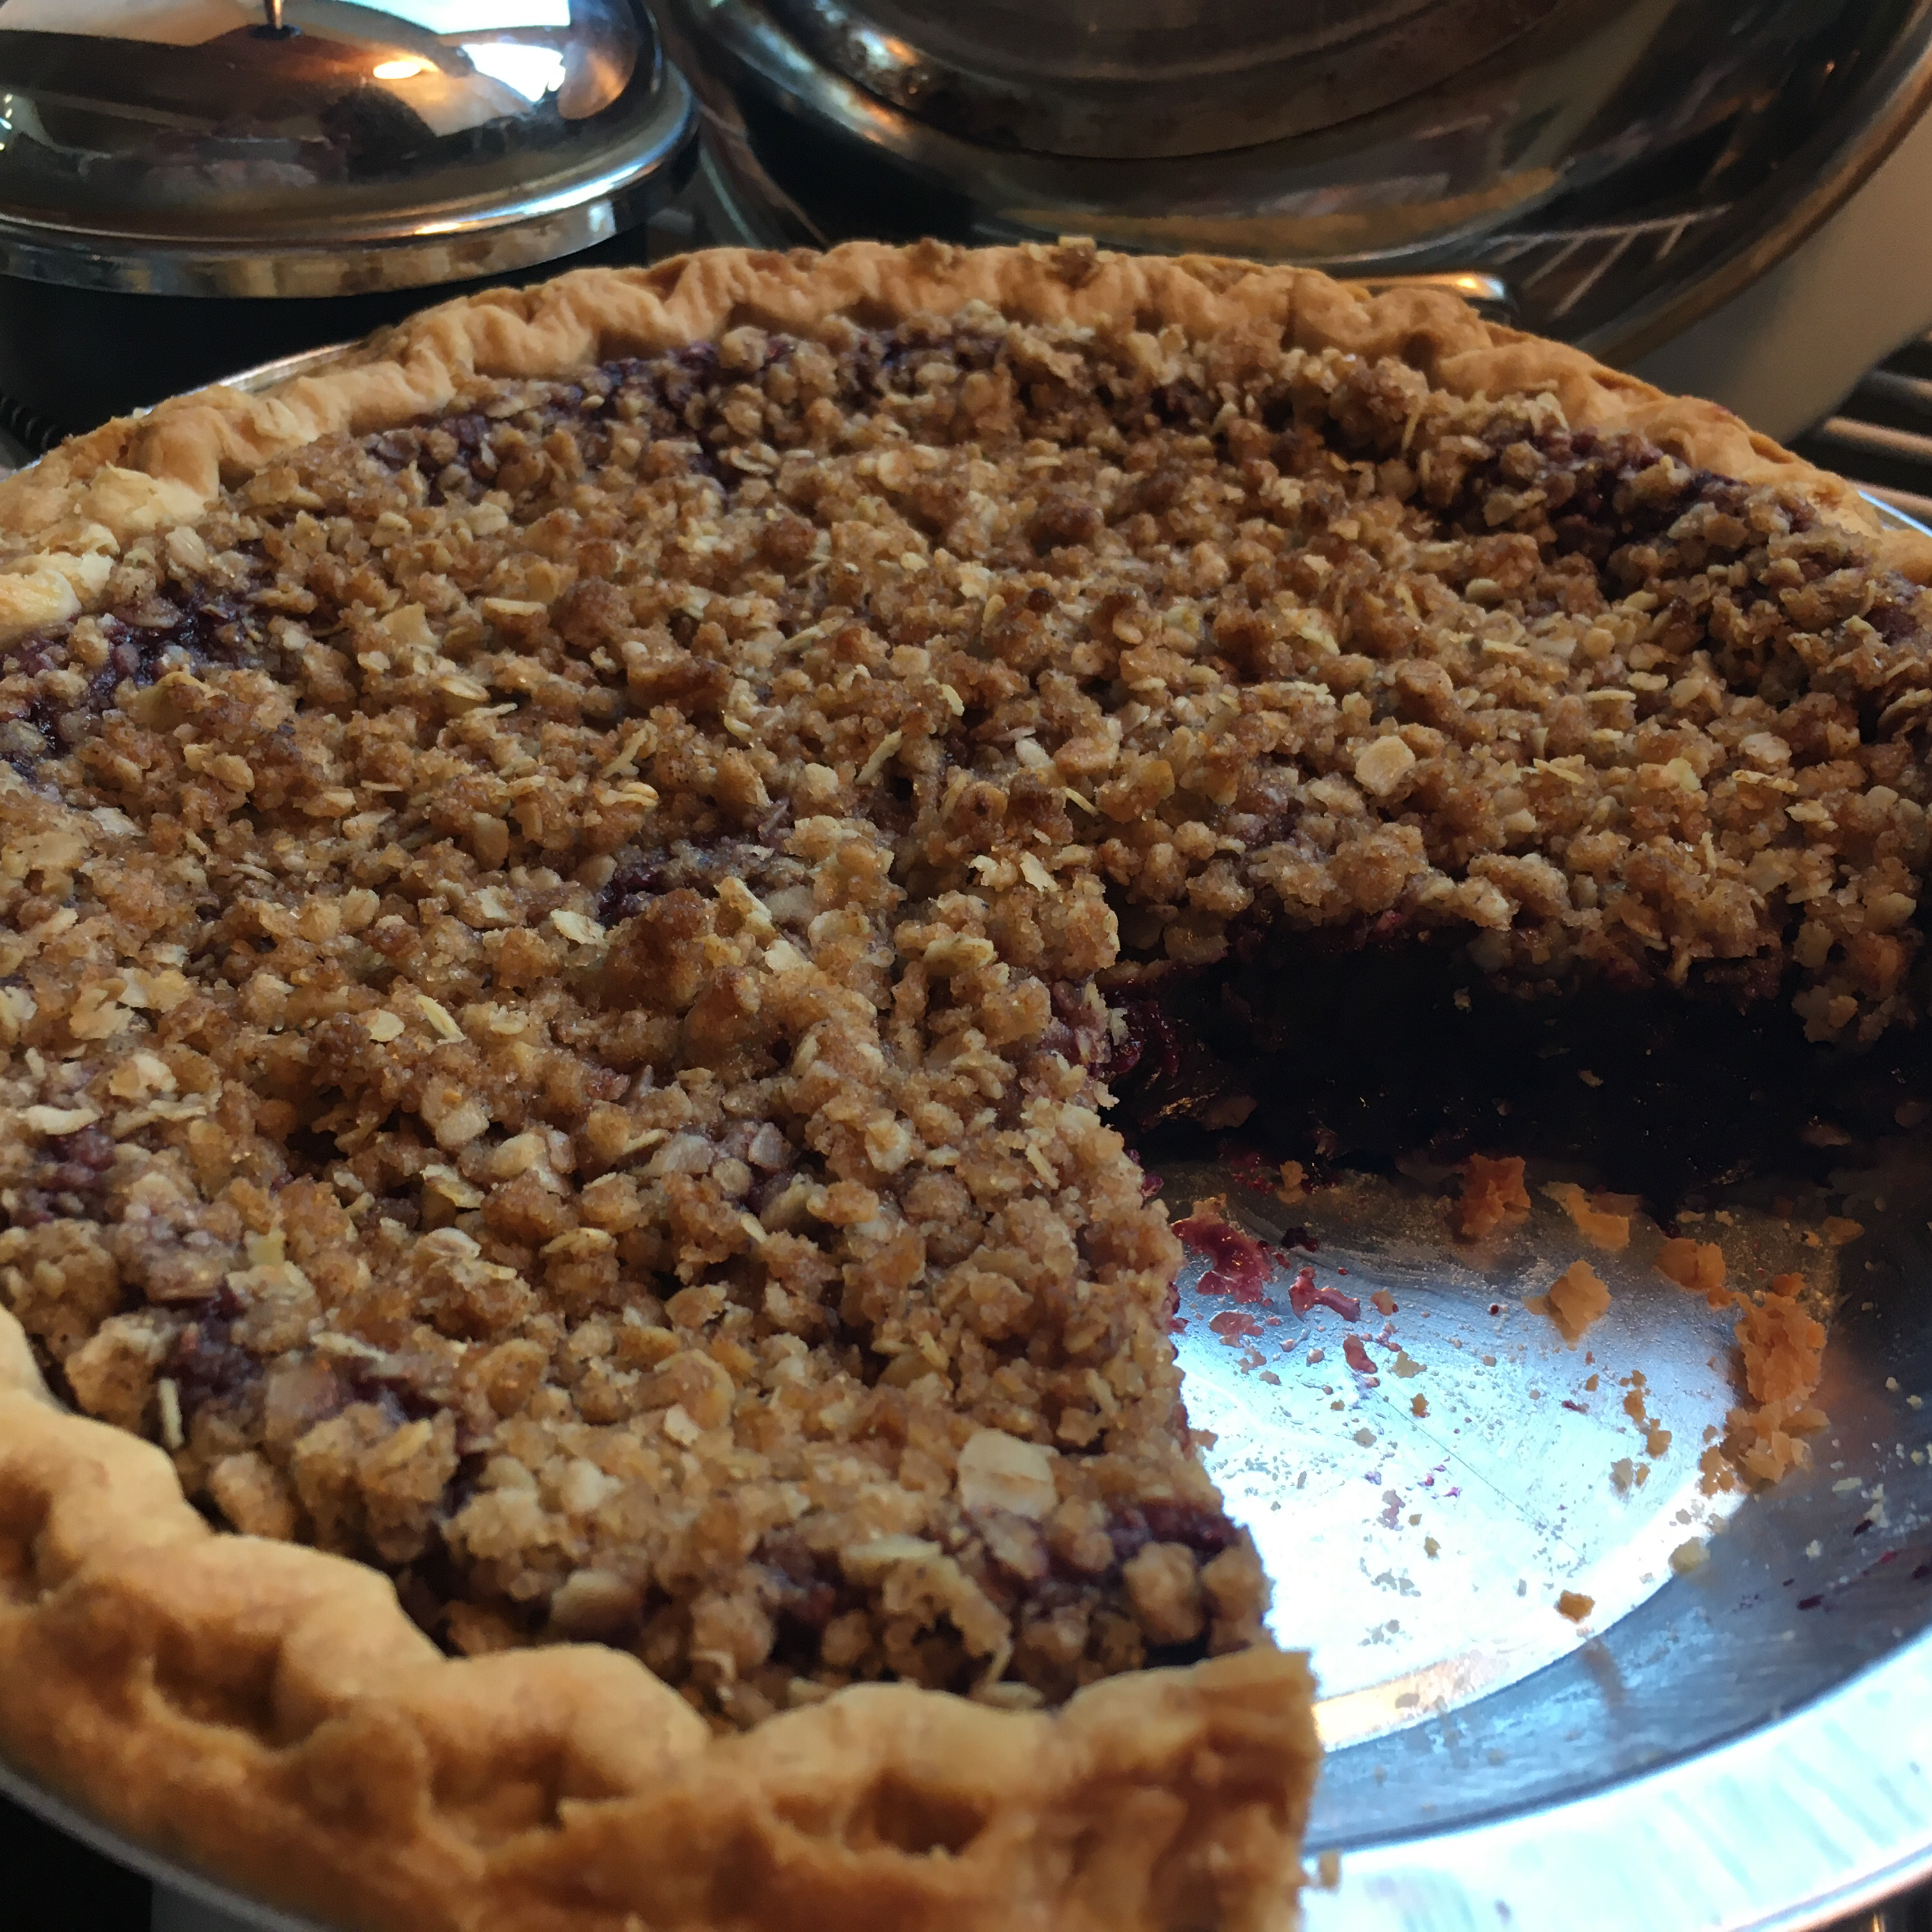 Concord Grape Pie II BeeingPat